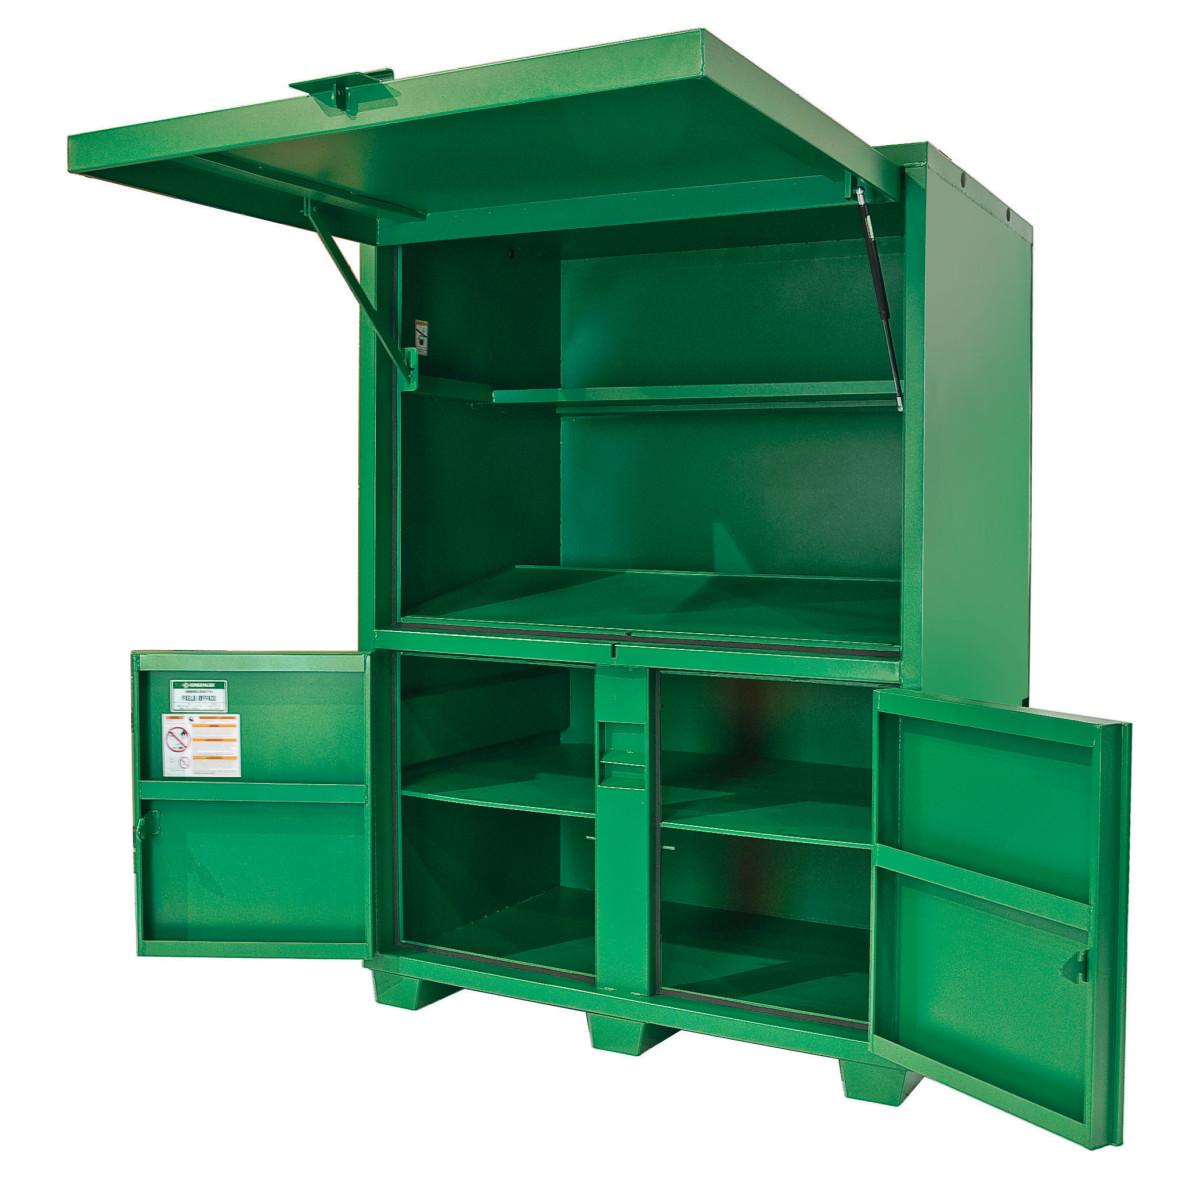 Greenlee 8060DLX Box Assy Field Office (8060Dlx)